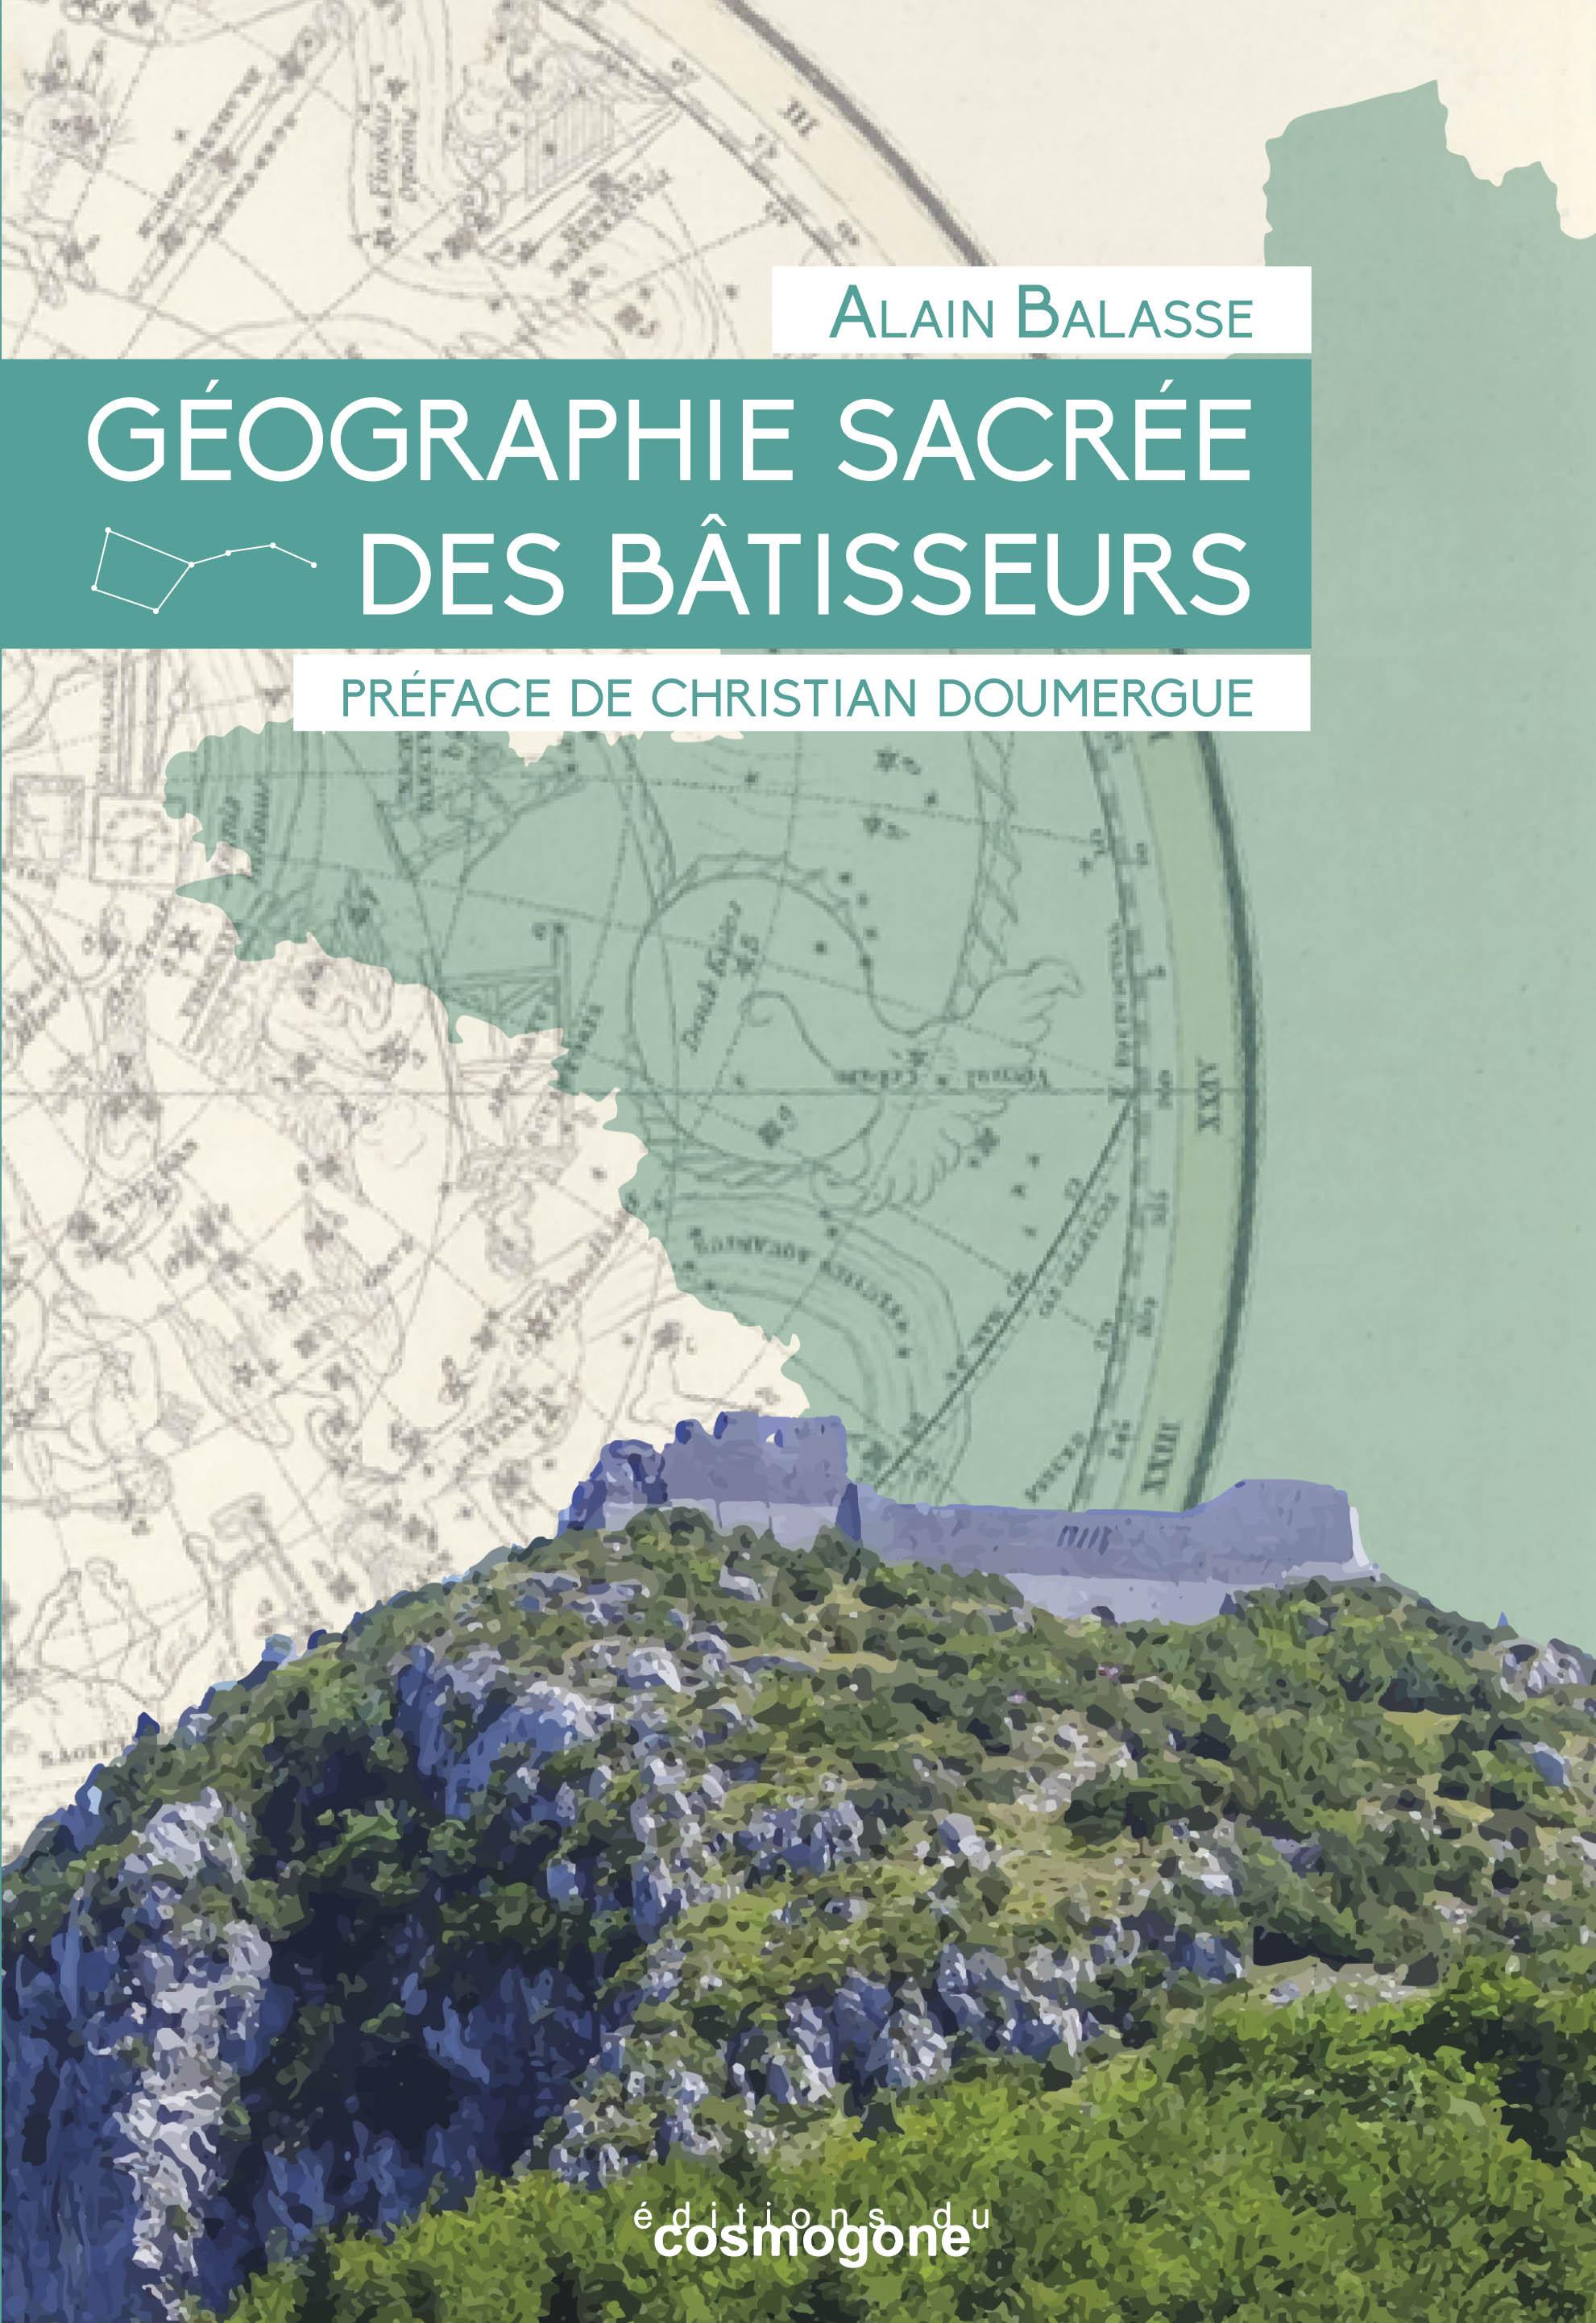 GEOGRAPHIE SACREE DES BATISSEURS